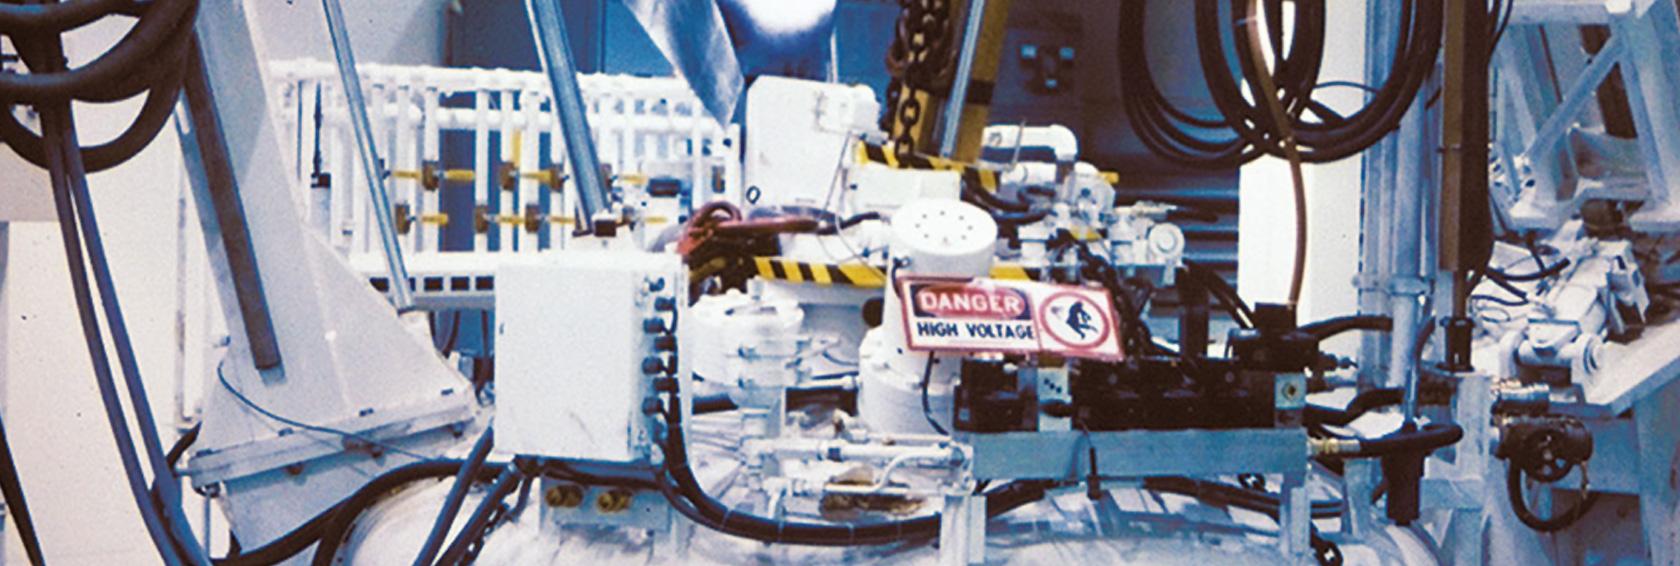 VFE Rotorode non-consumable melting furnaces